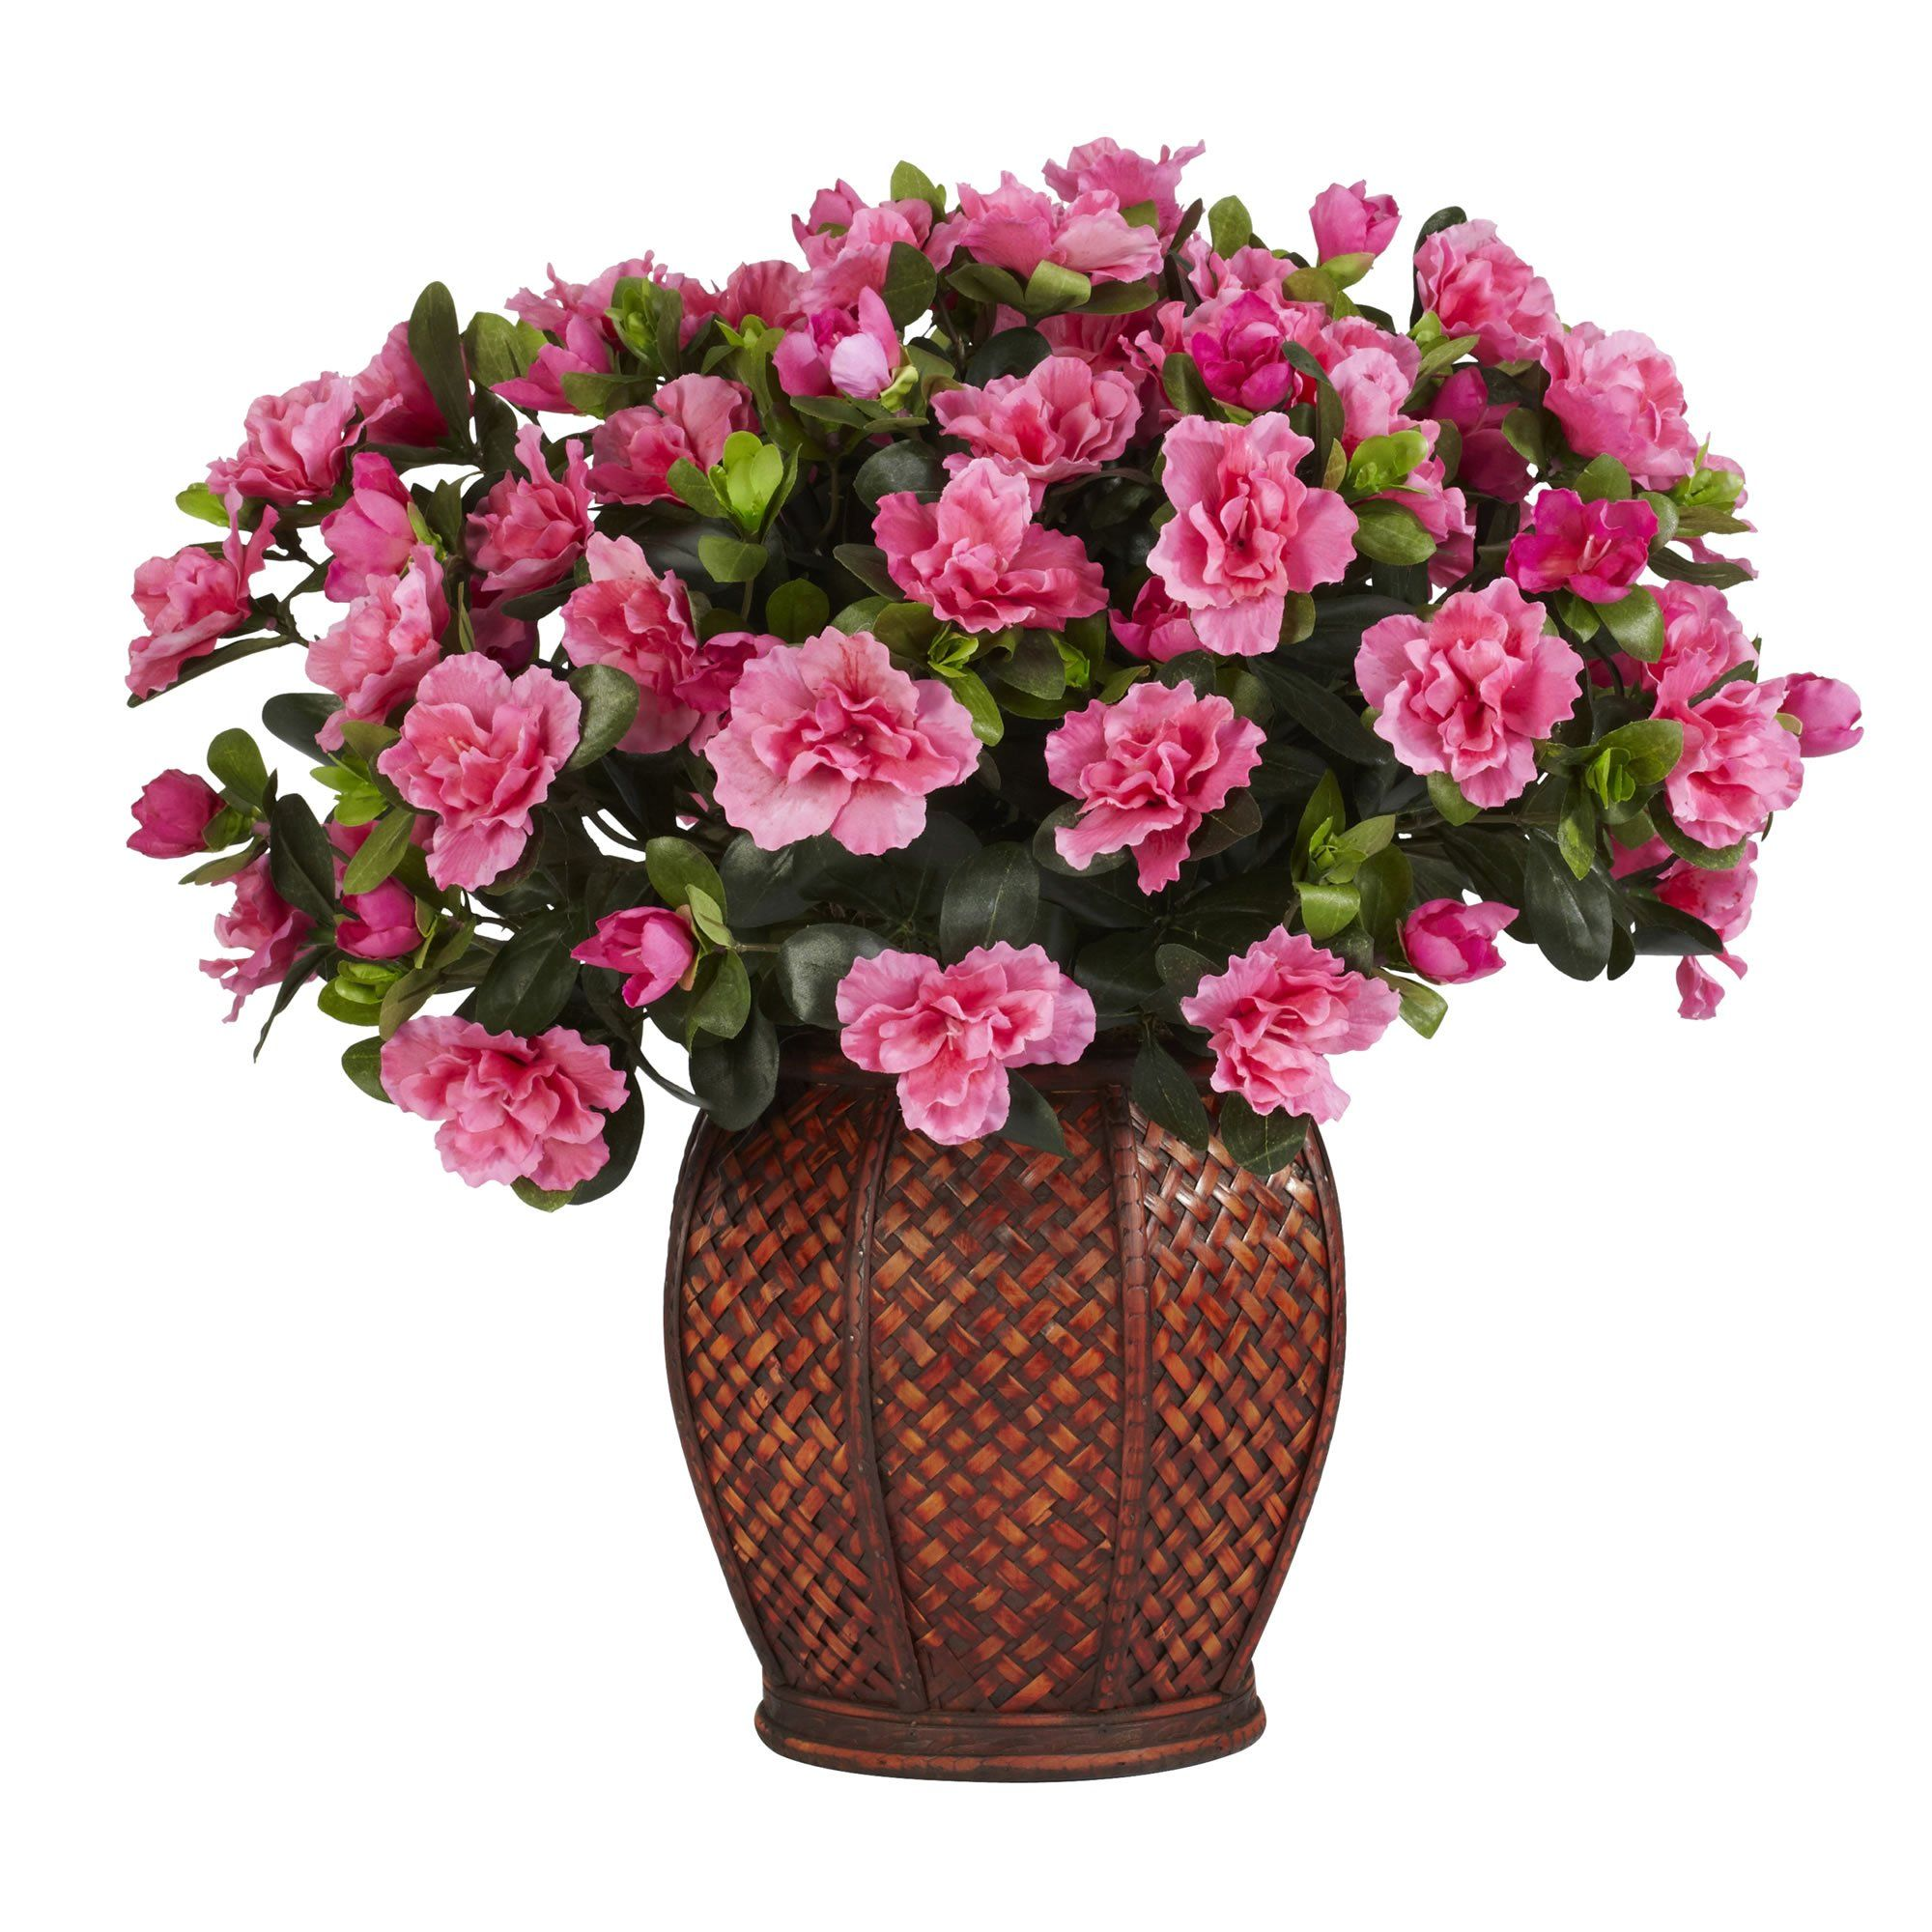 Azalea w/Vase Silk Plant Artificial flowers, Silk plants